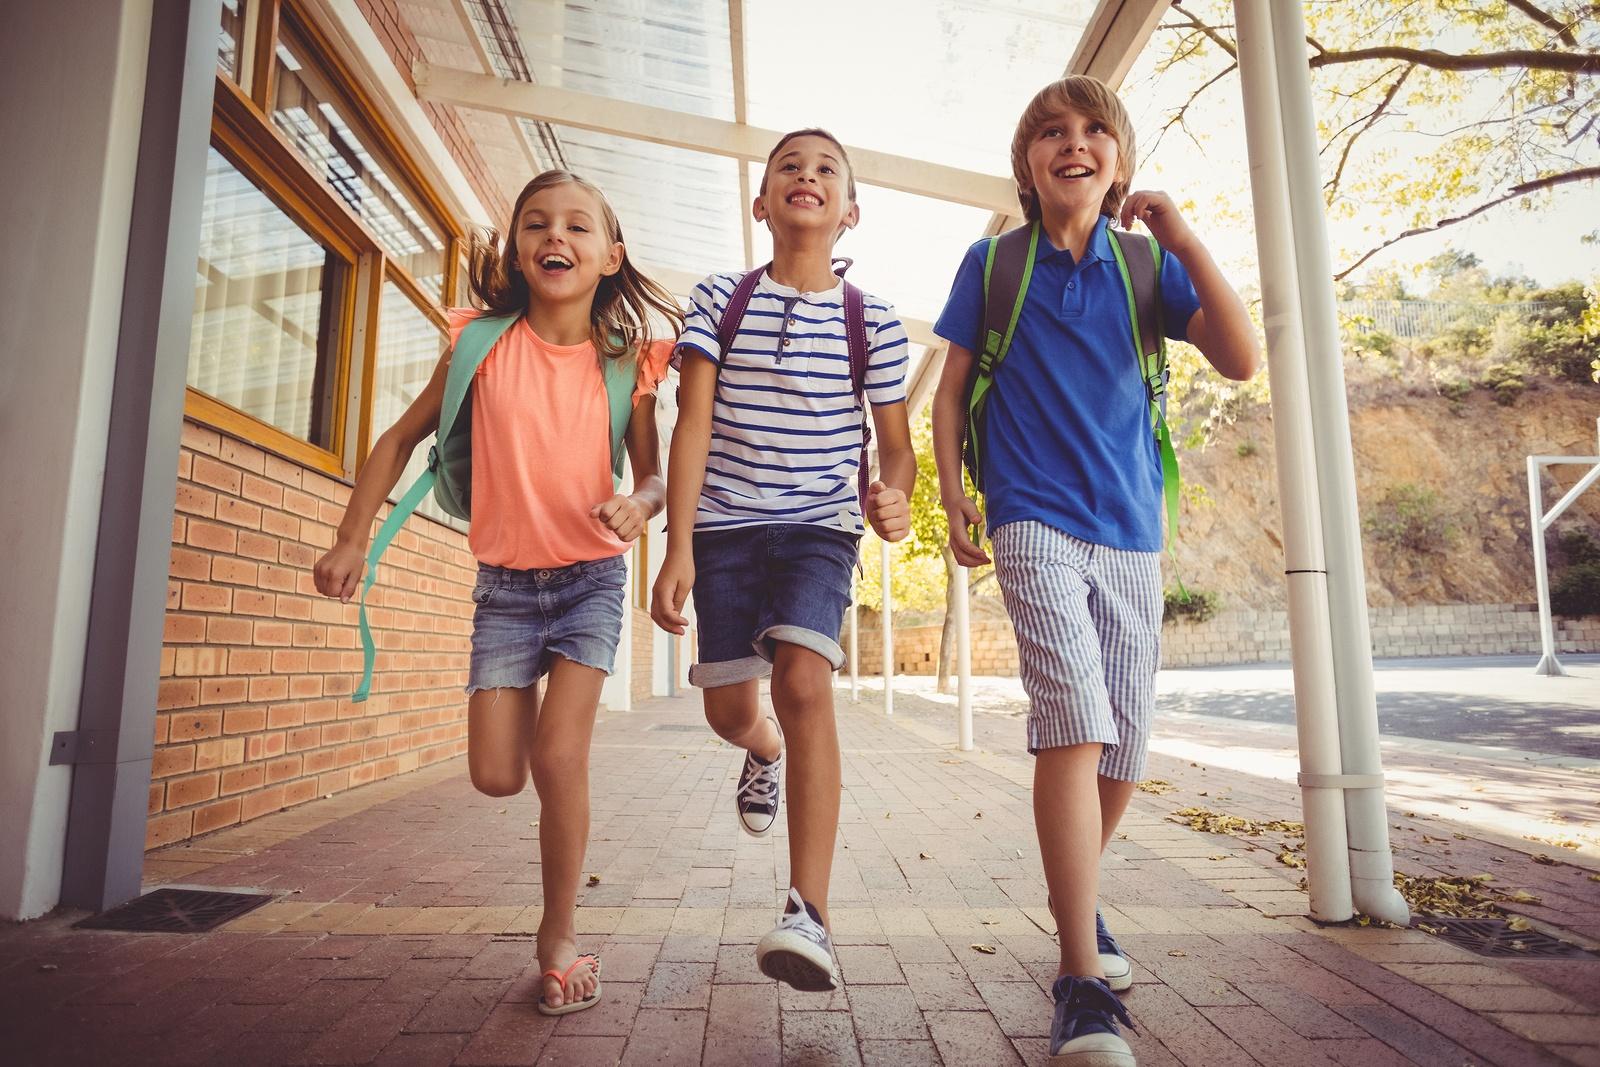 detroit school cleaning, livonia school cleaning, dearborn school cleaning, downriver school cleaning